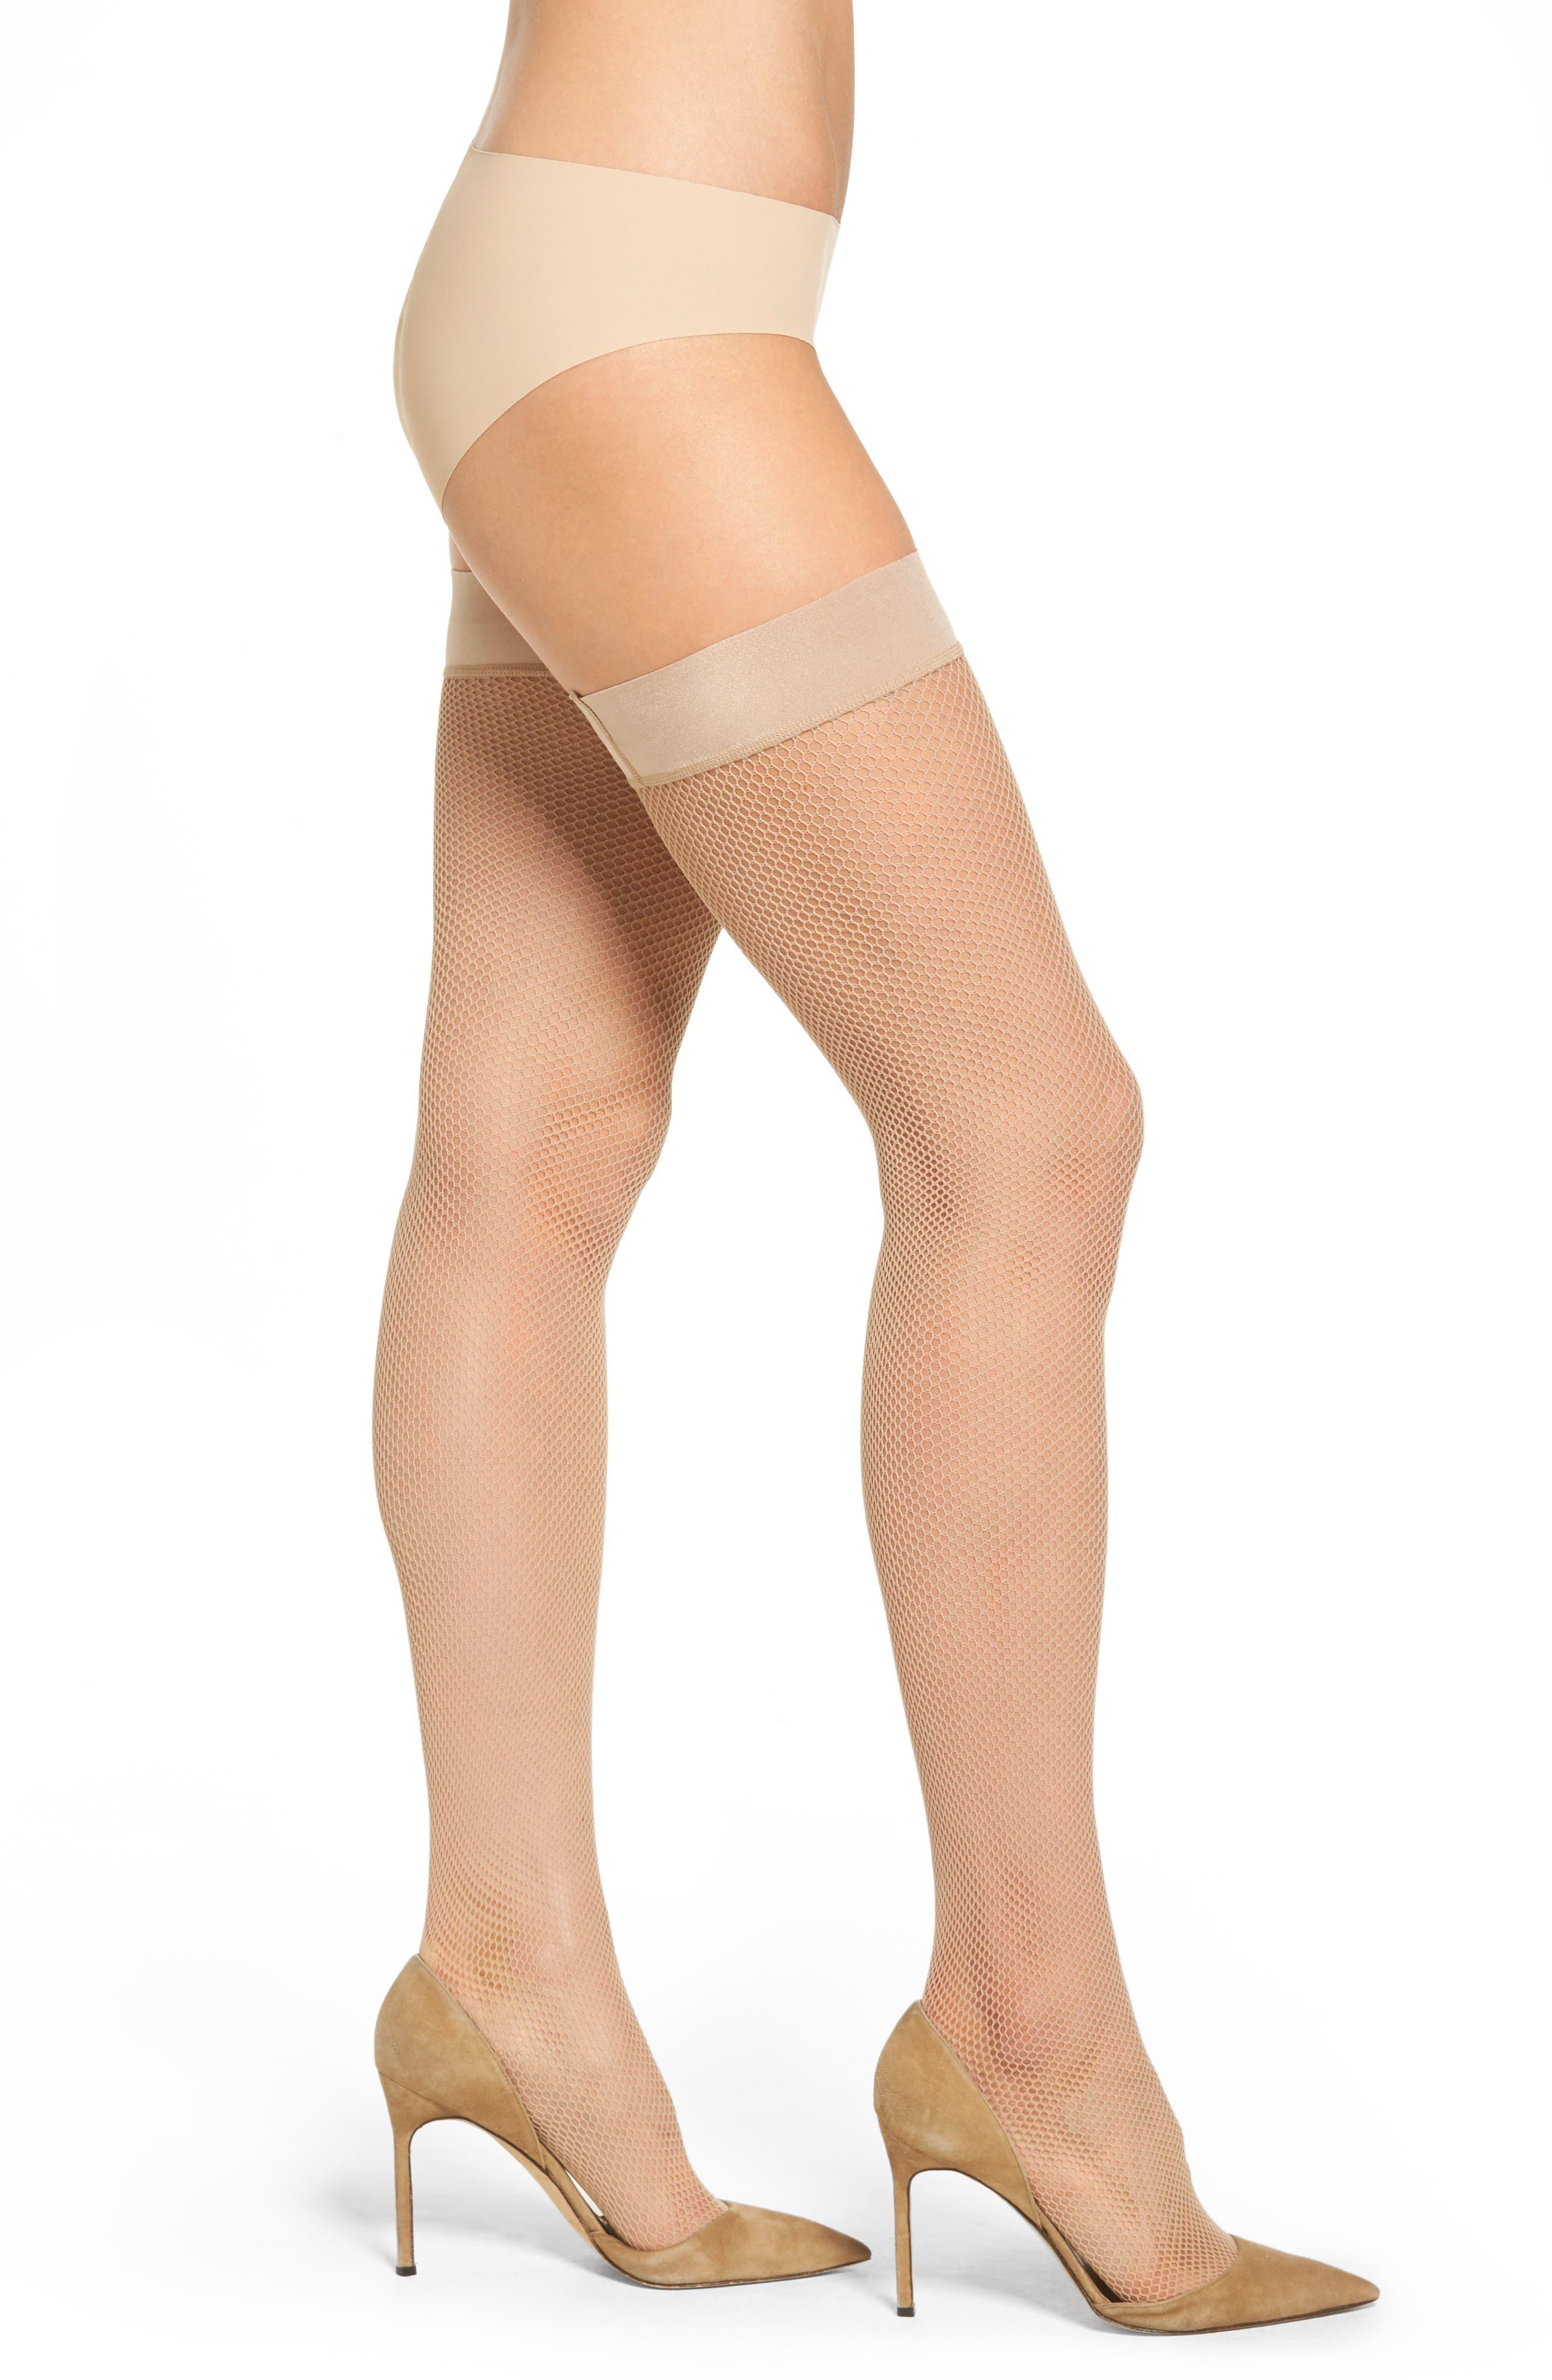 DKNY Fishnet Stay-Up Stockings